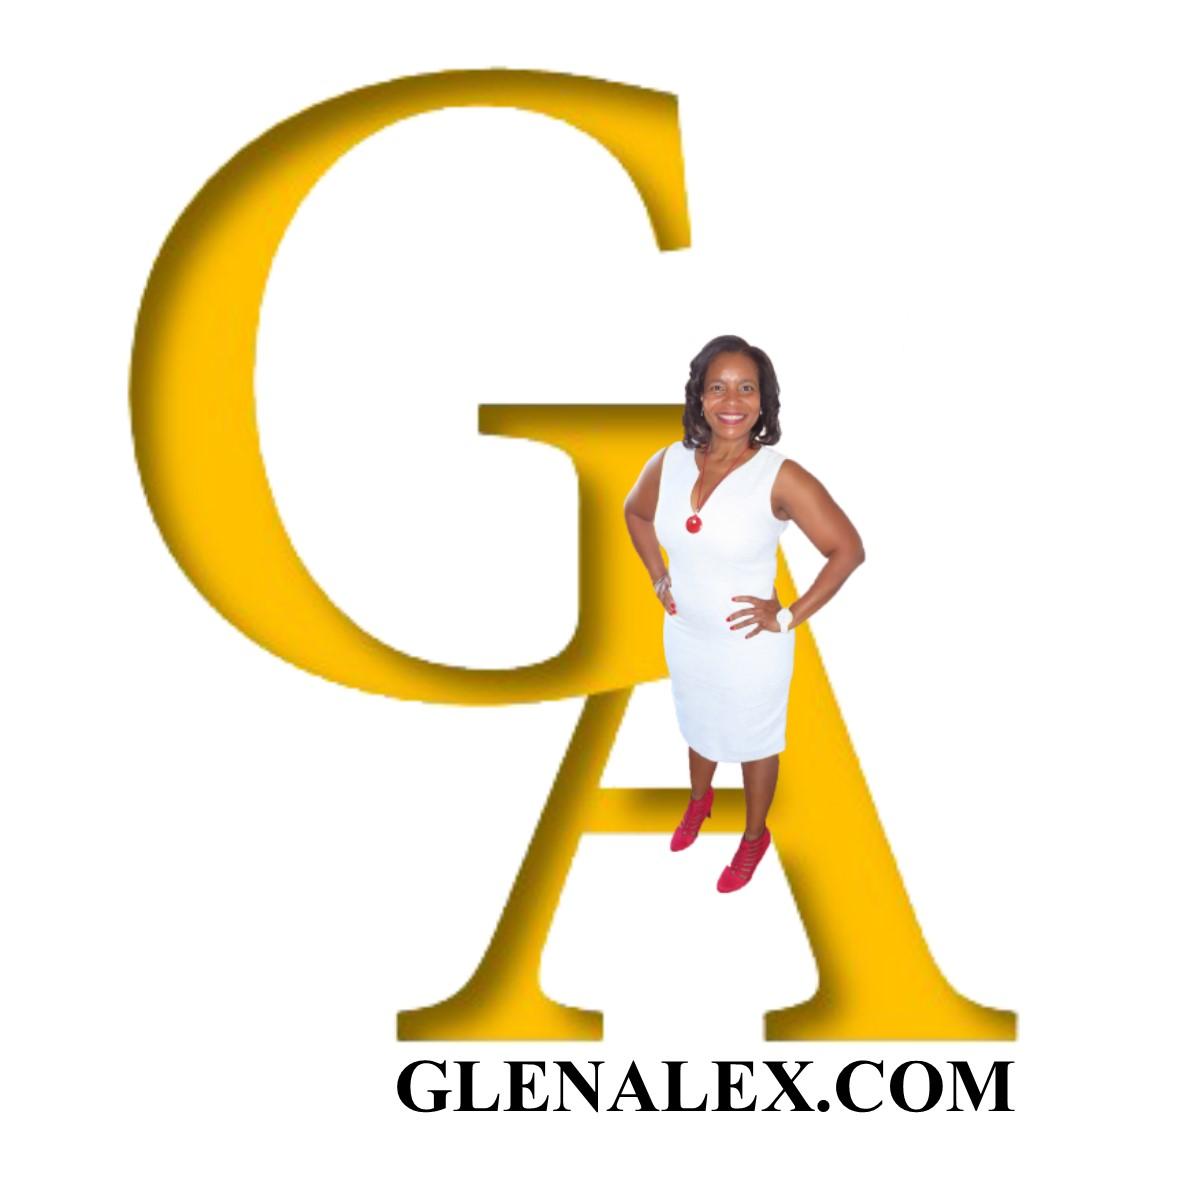 Glen Alex: Author, Wellth Coach, Clinical Social Worker, Las Vegas, Nevada